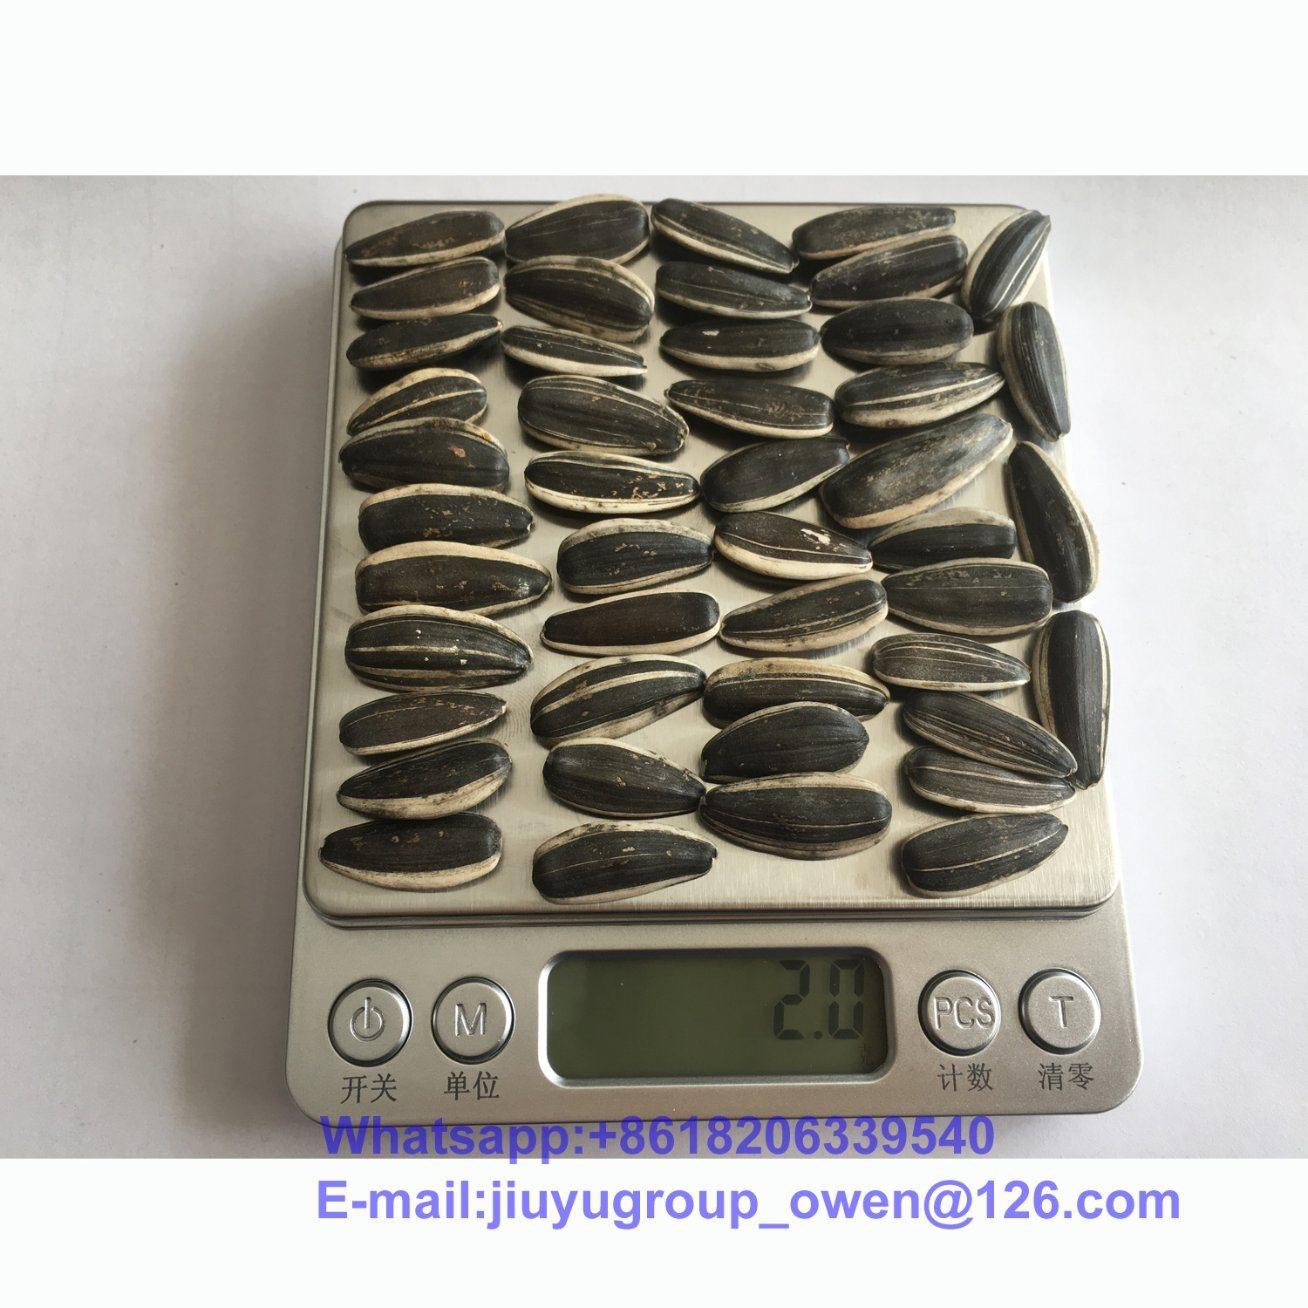 Inner Mongolia New Crop Sunflower Seeds